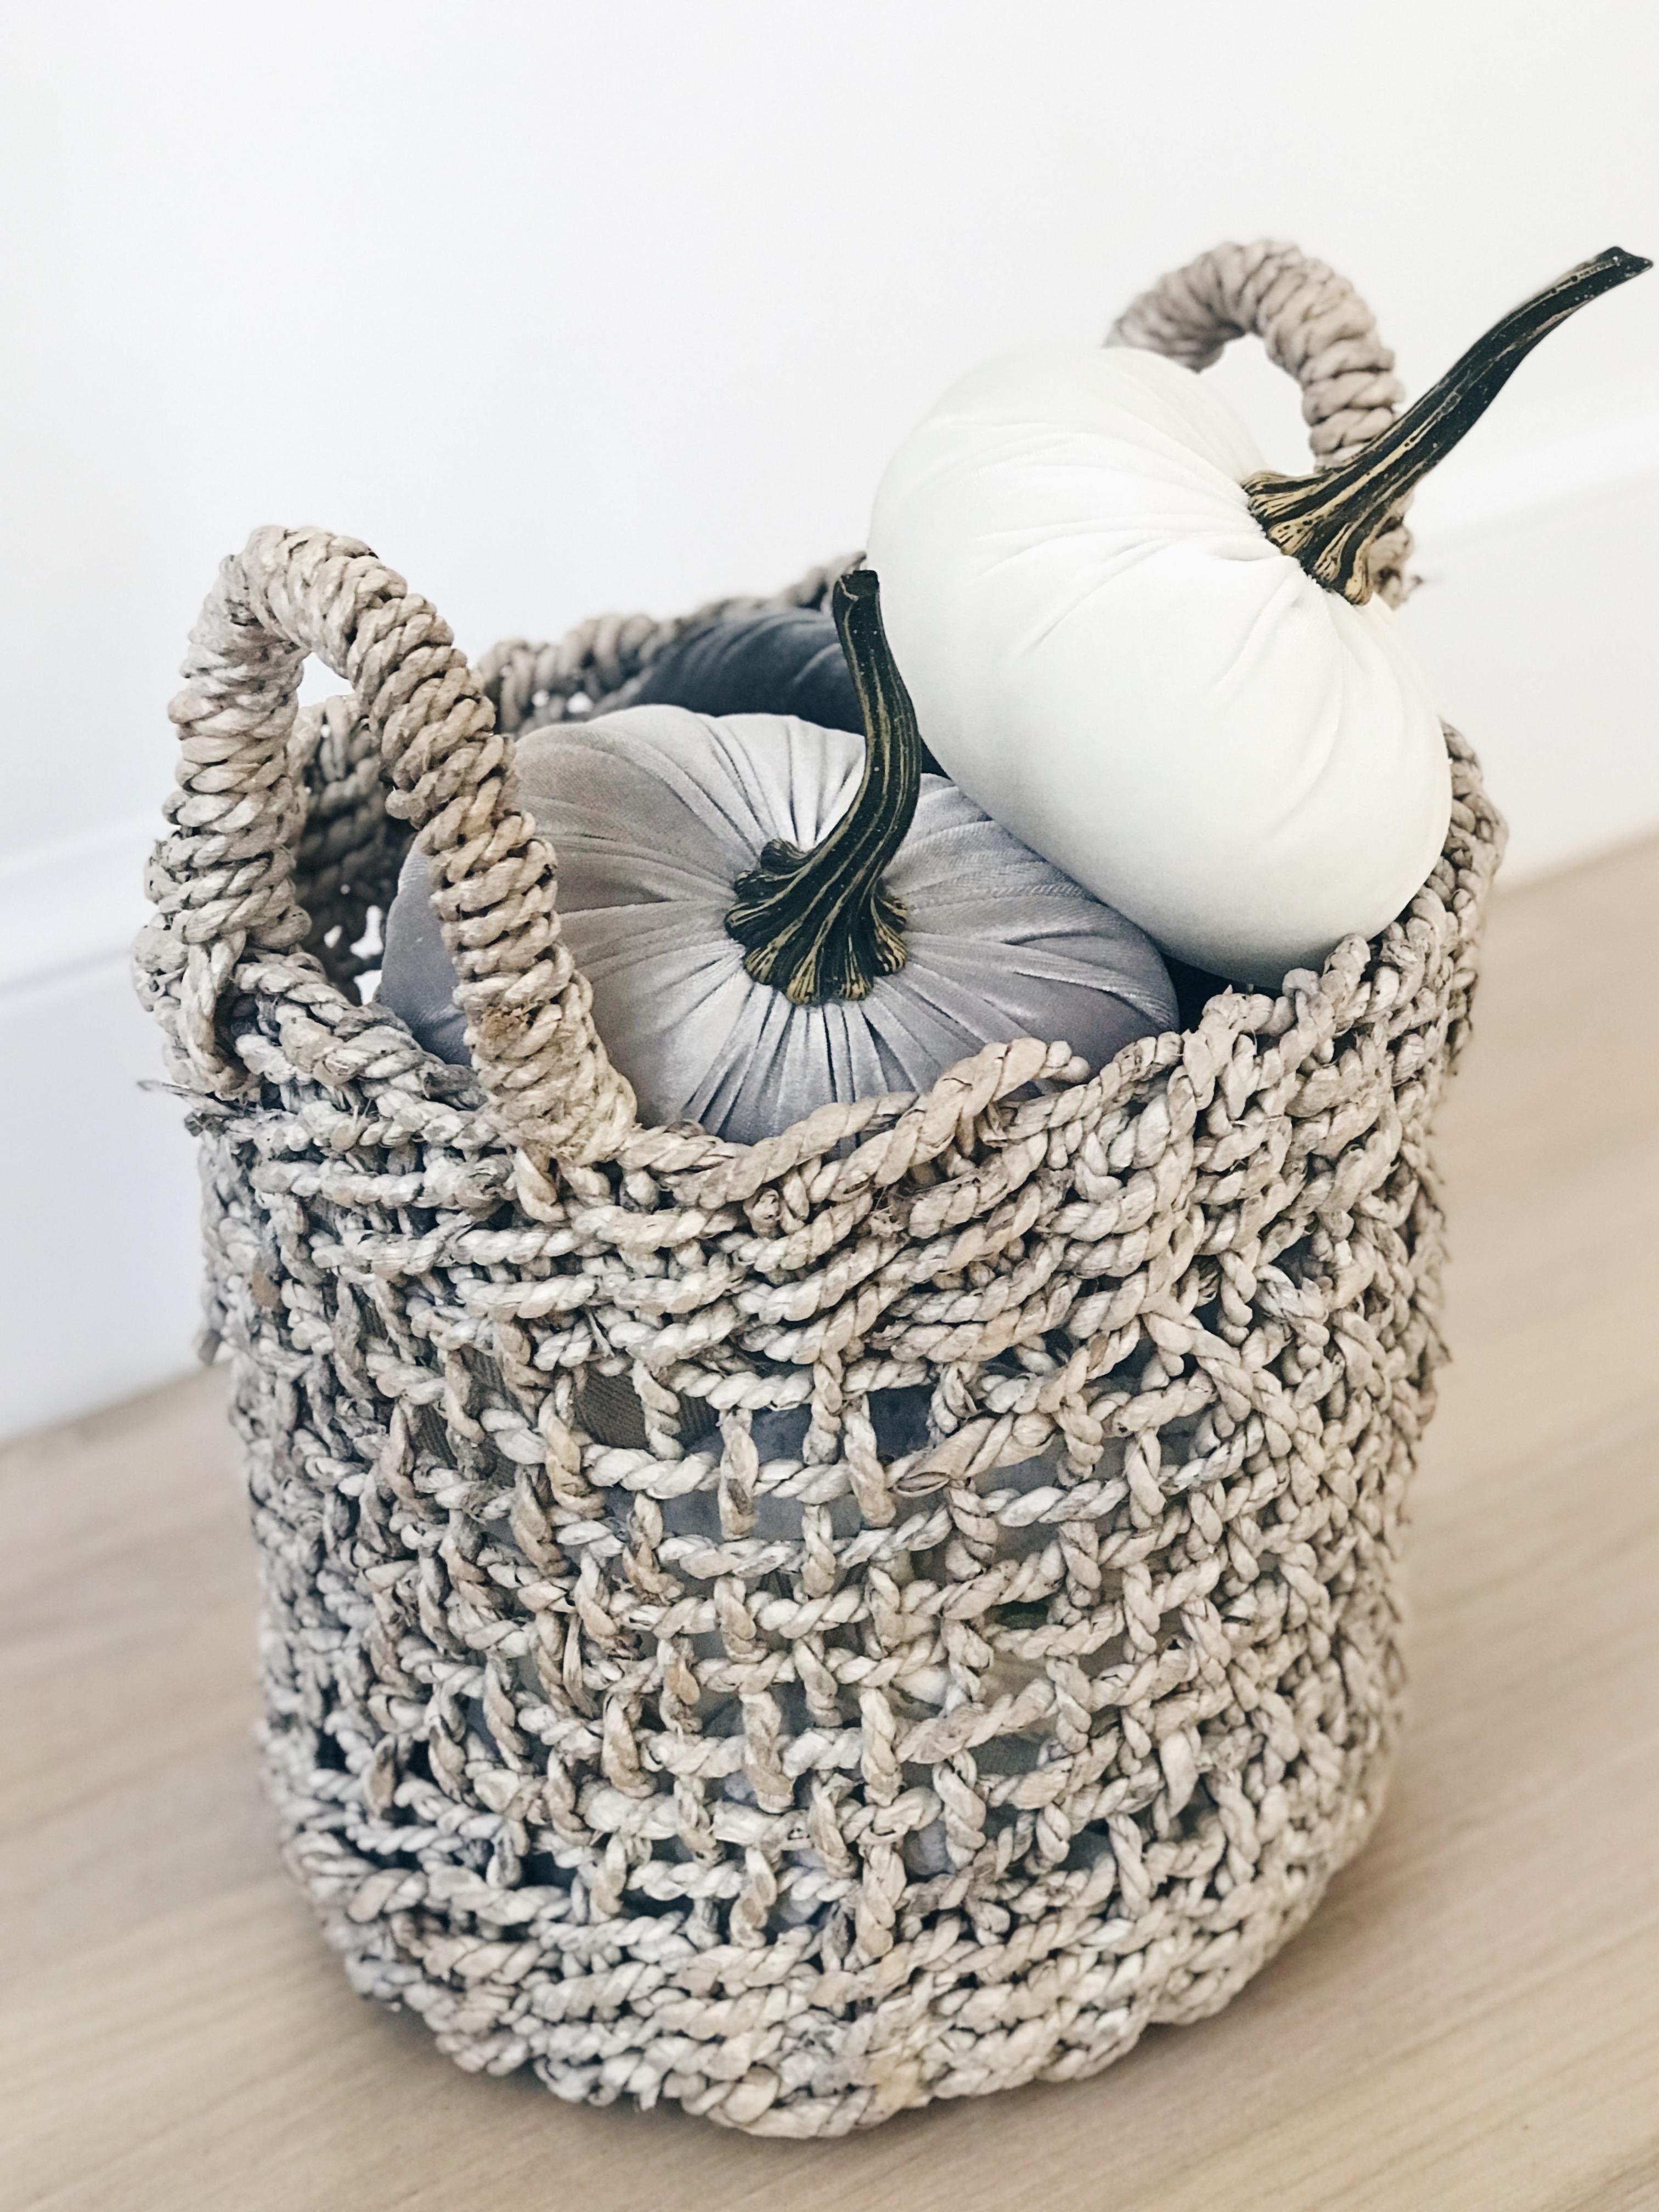 favorite fall home decor 2018 - velvet pumpkins on pinterestingplans connecticut lifestyle blog